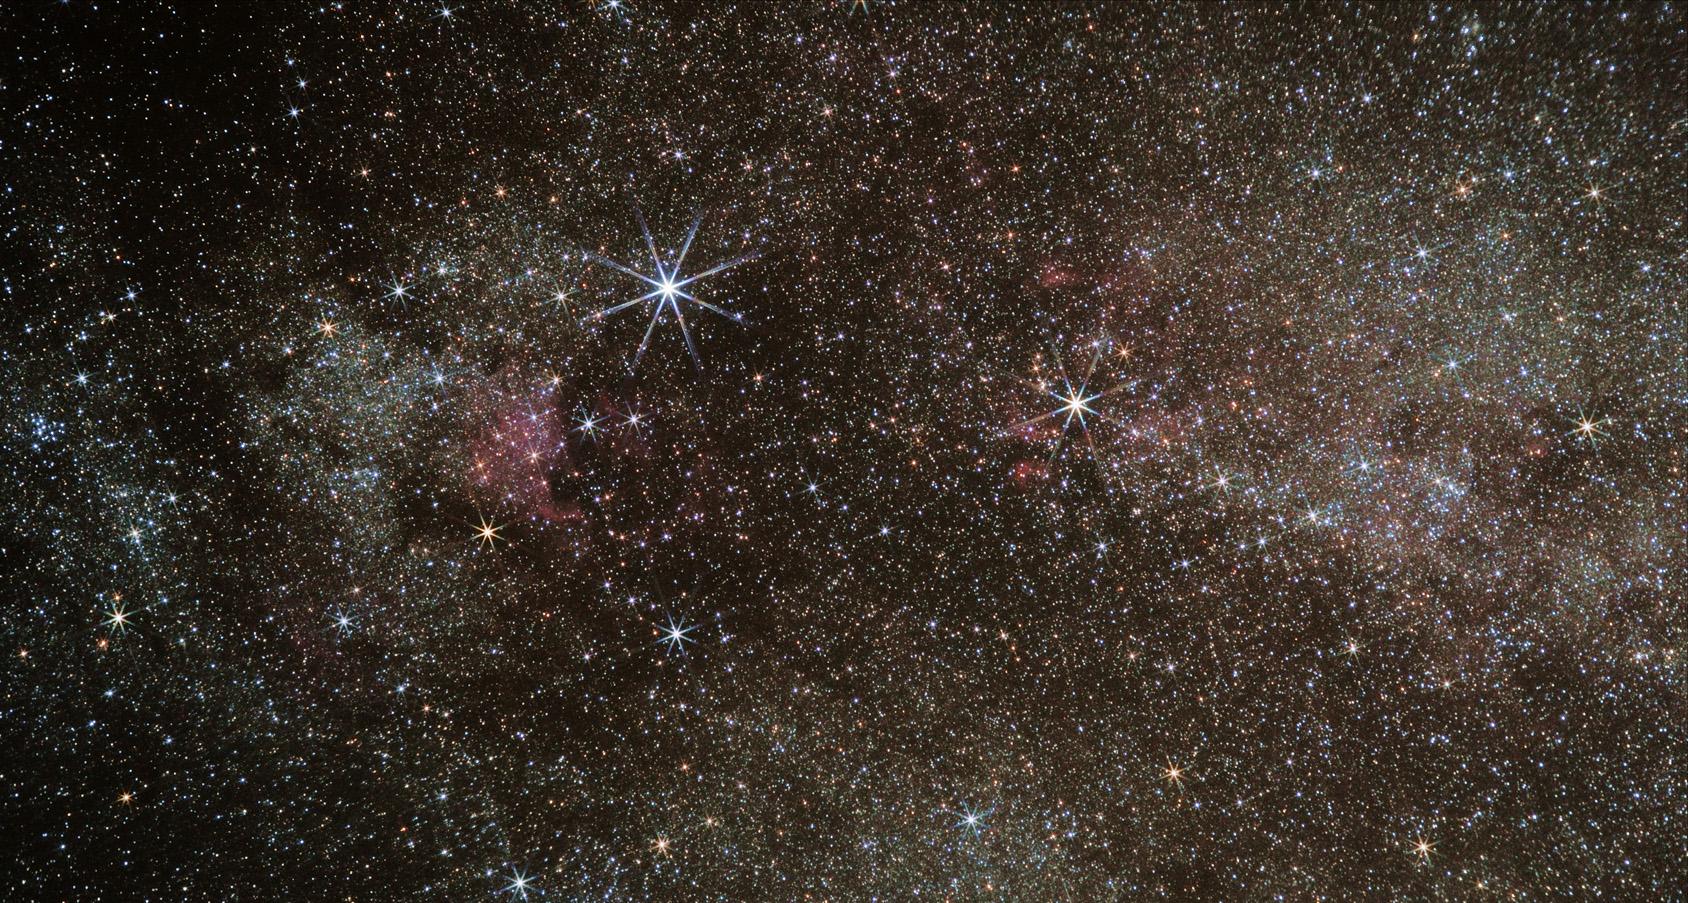 Cygnus with didymium (red enhancing) filter north american nebula, pelecan nebula, butterfly nebula